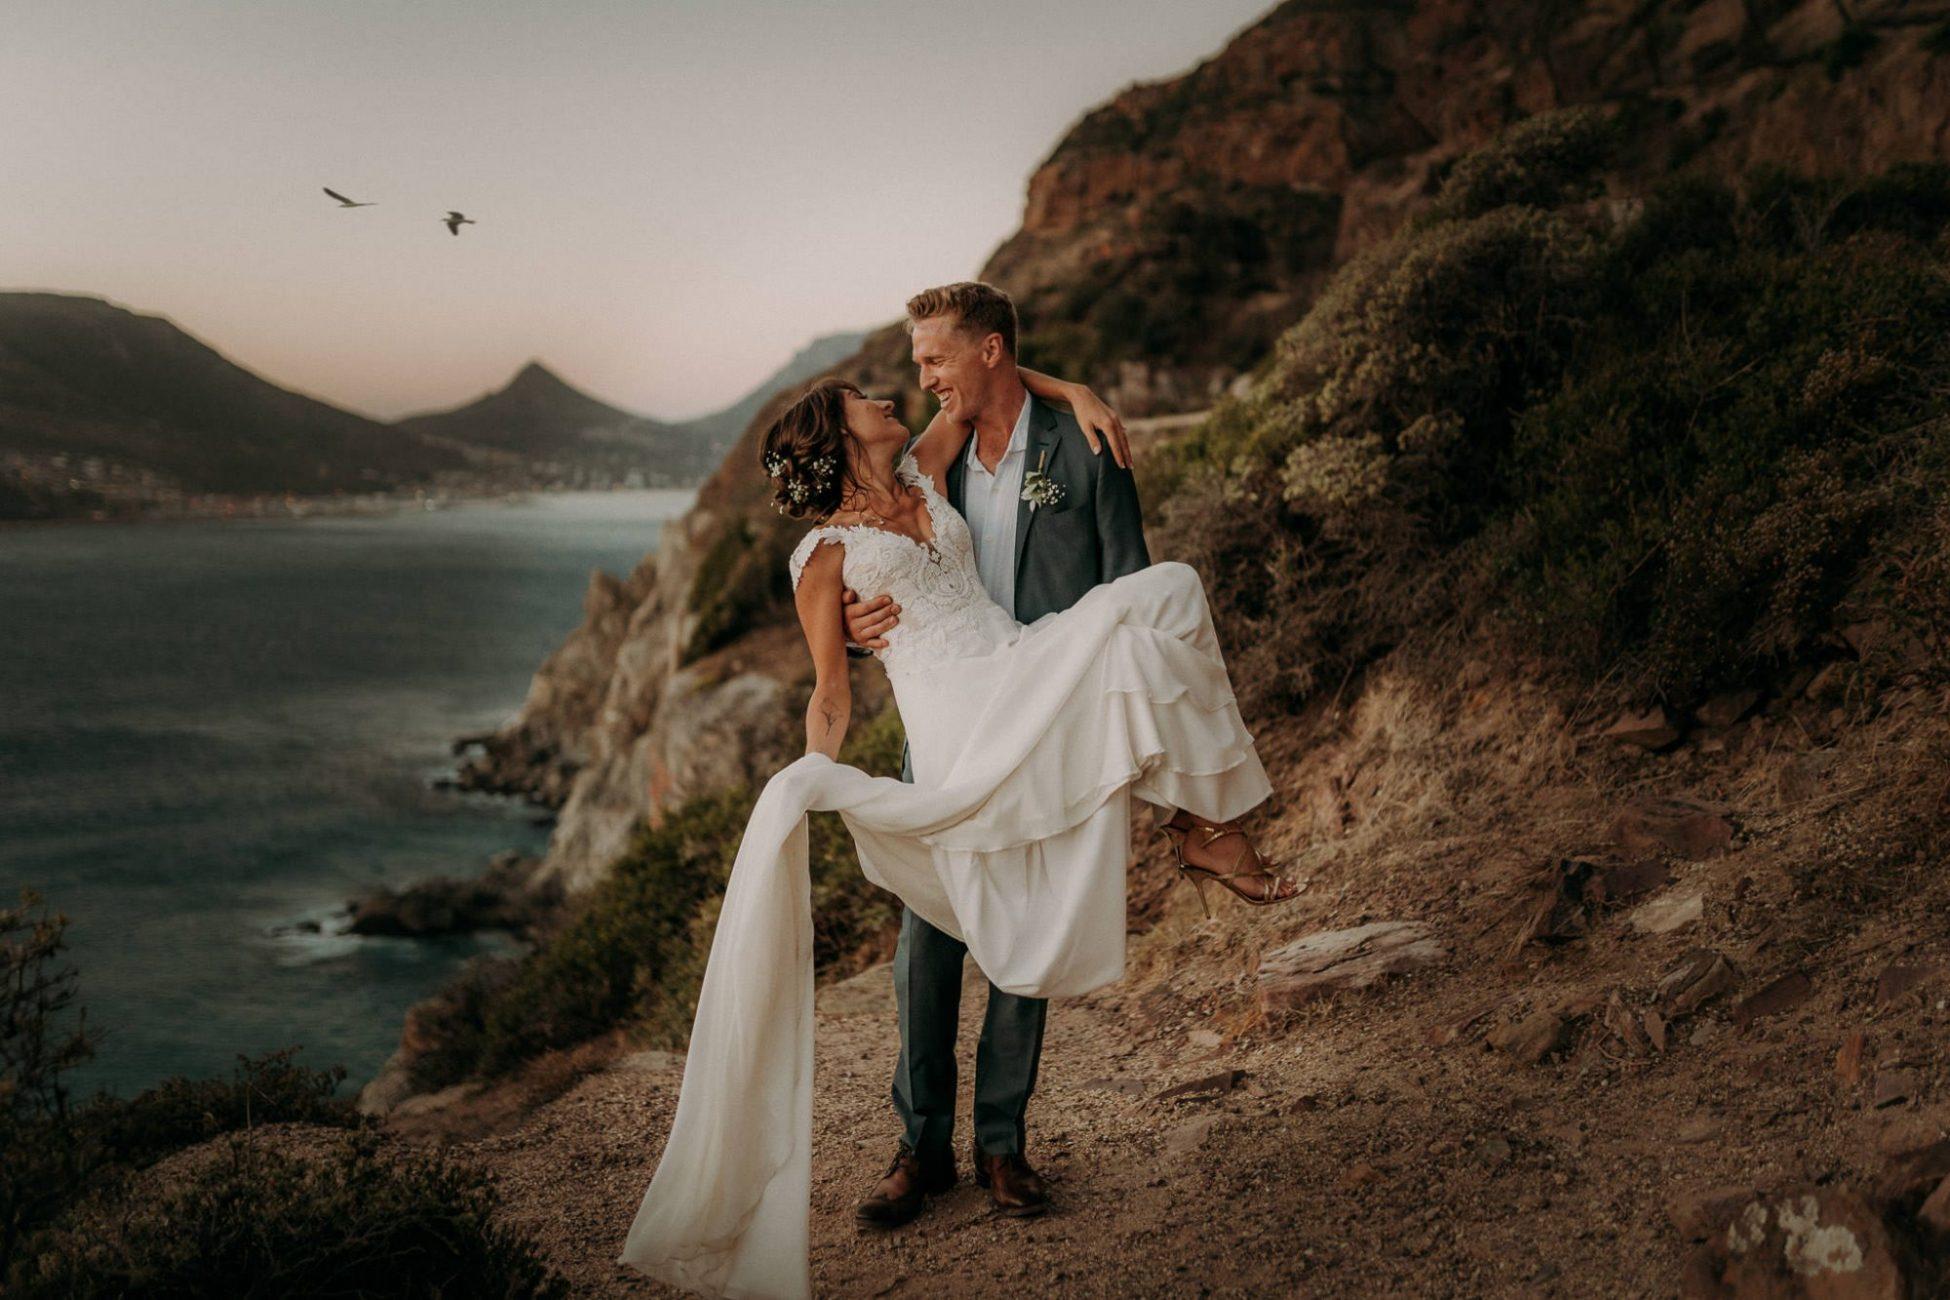 capetownweddingphotographer-chapmans-peak-noordhoek-capetown-sunset-elopement